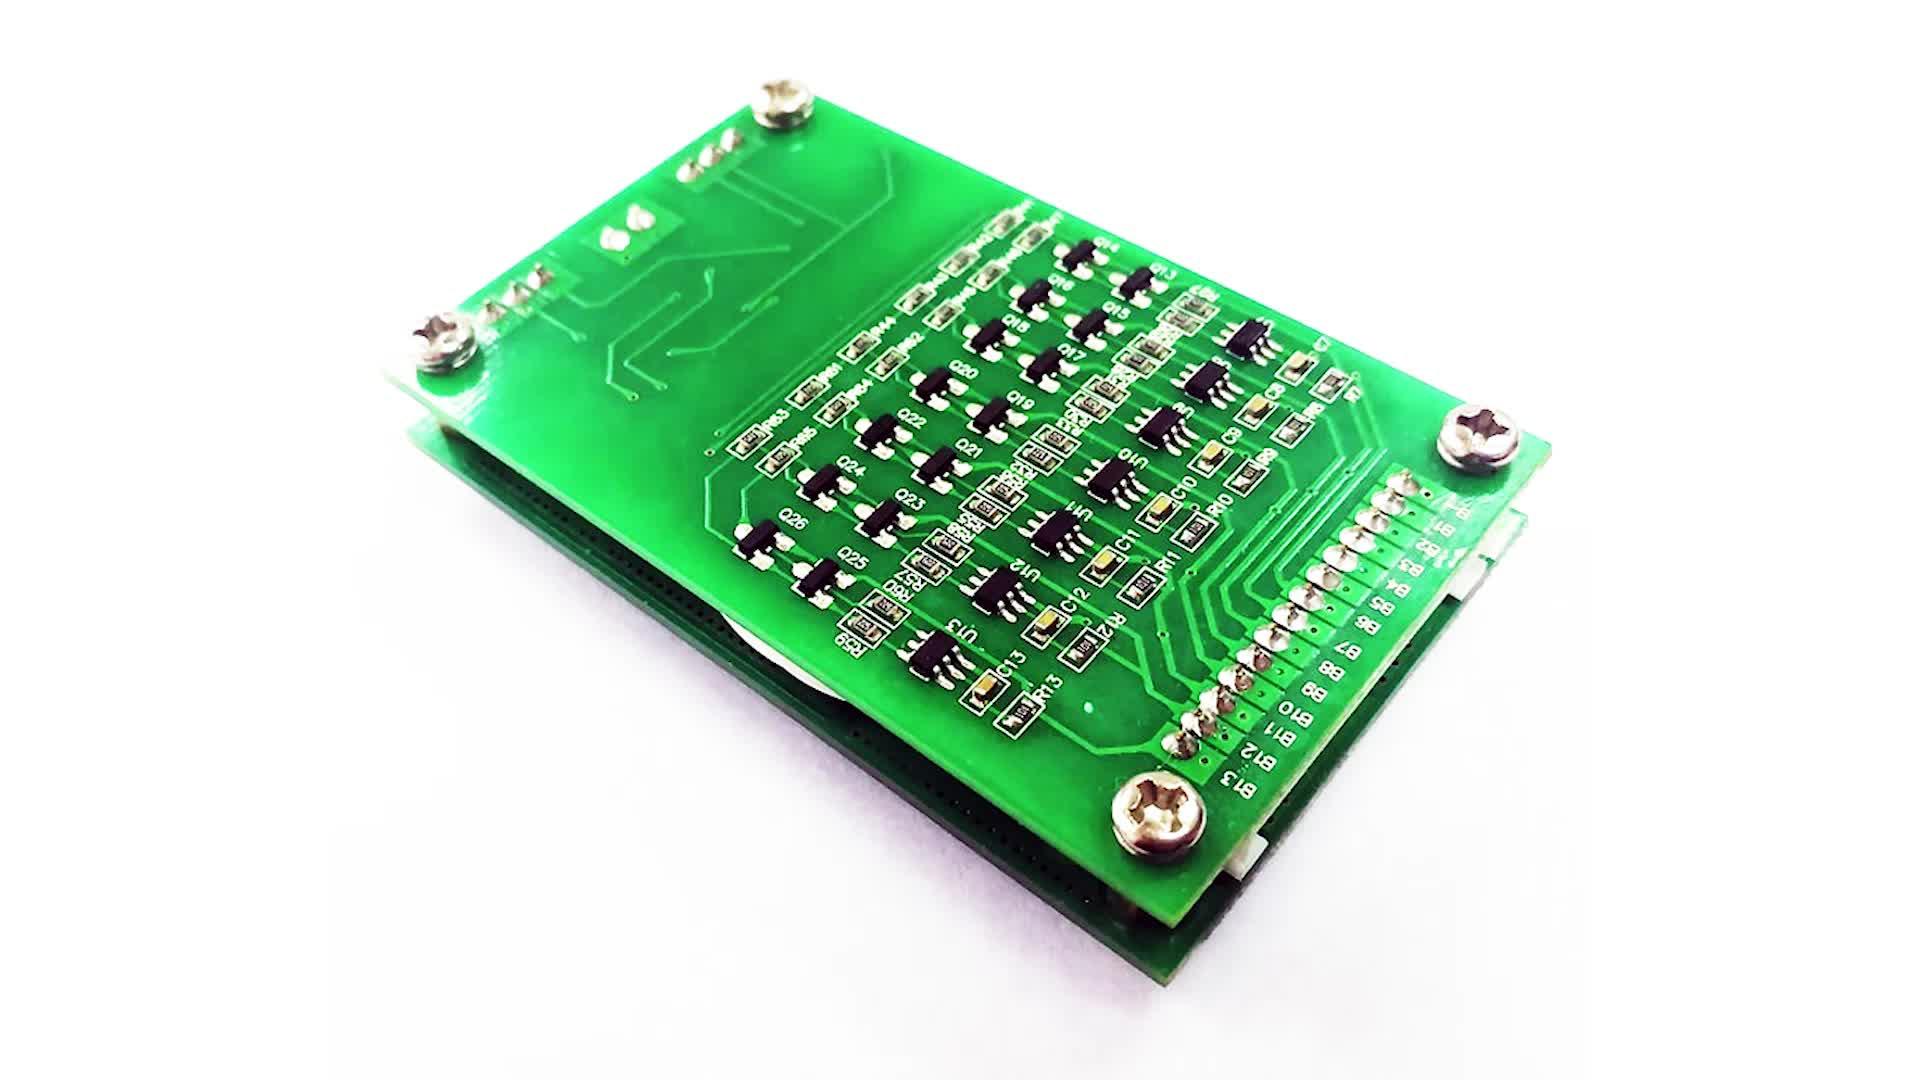 Smart PCB BMS 10S 20A Battery Management System for 36V li-ion battery